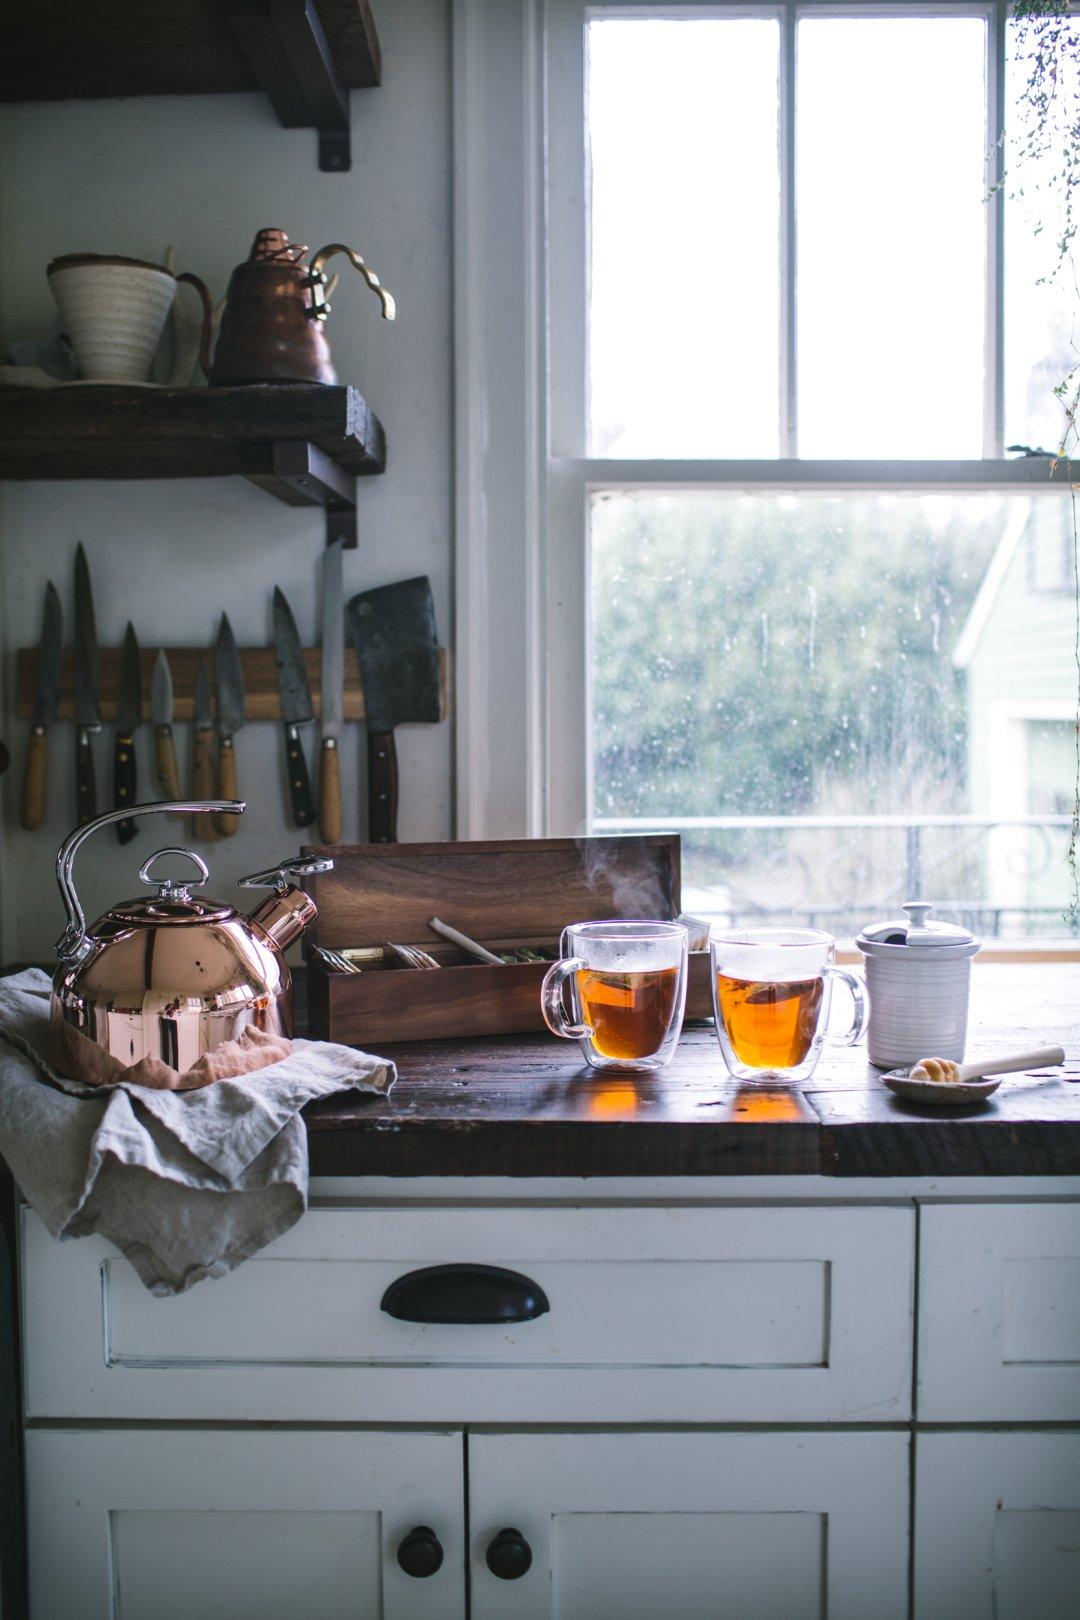 Copper tea kettle, two mugs of steeping tea, honey pot, and tea box on countertop